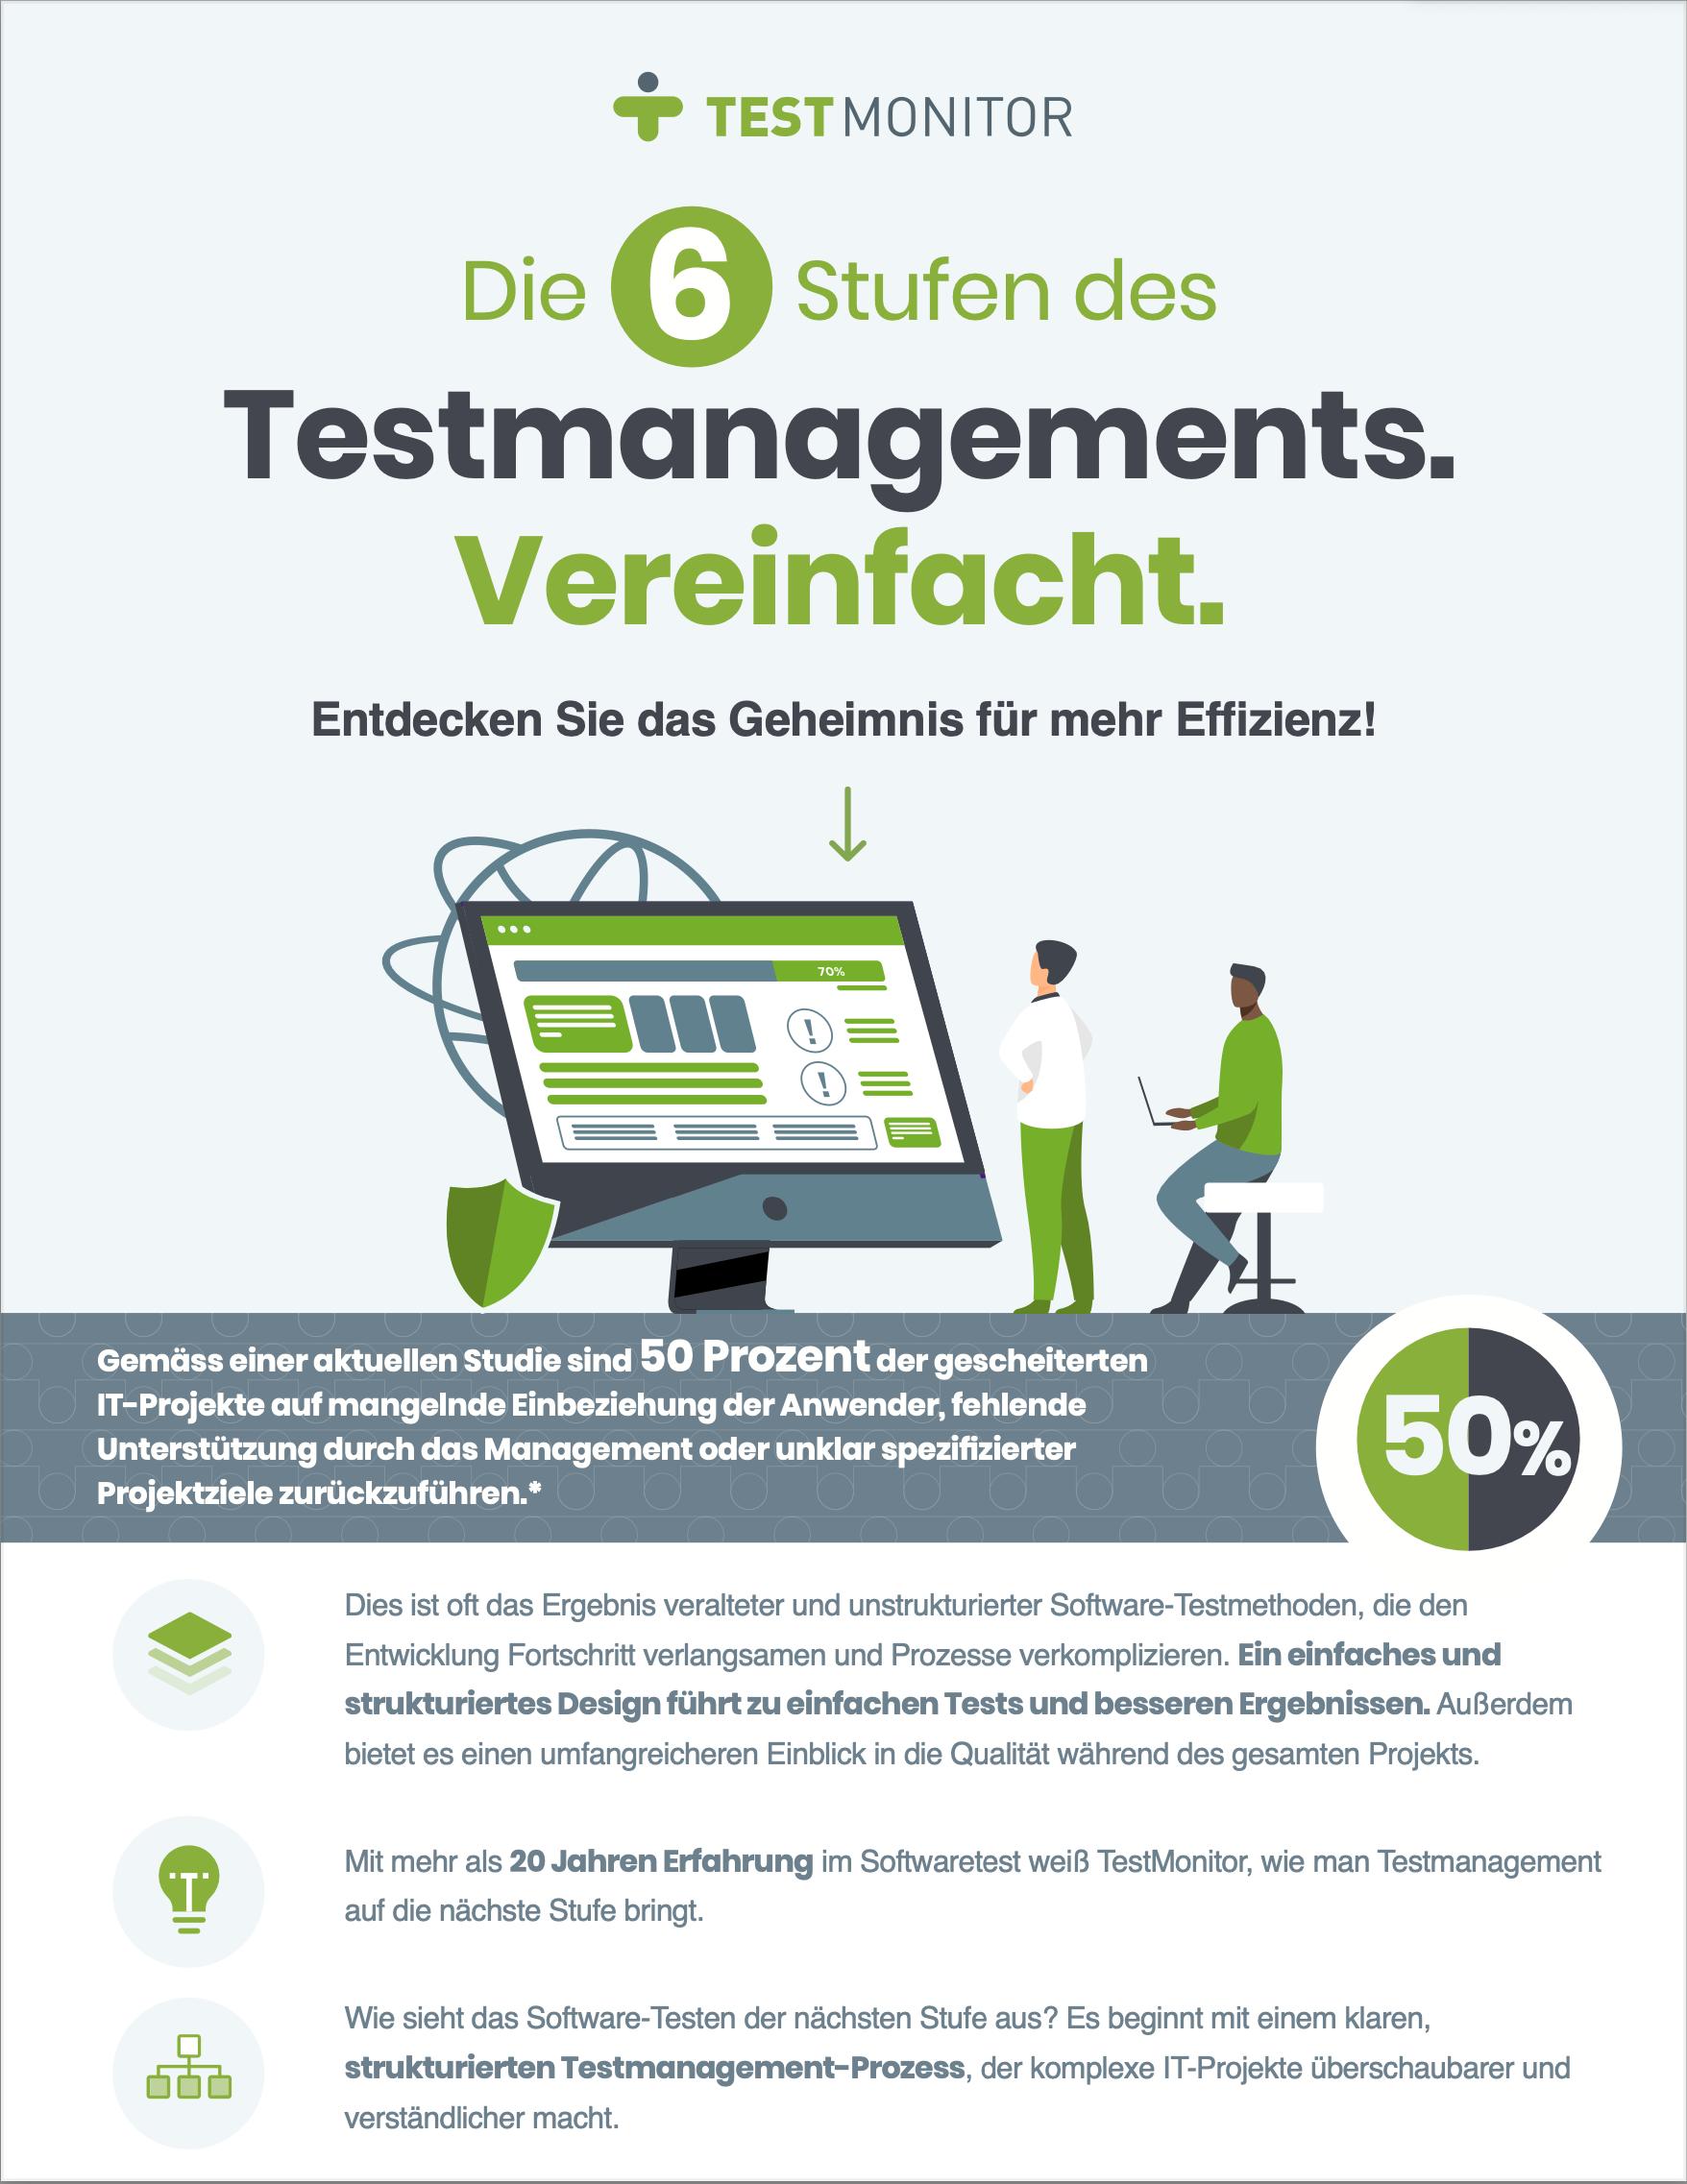 TM-Infographic DE